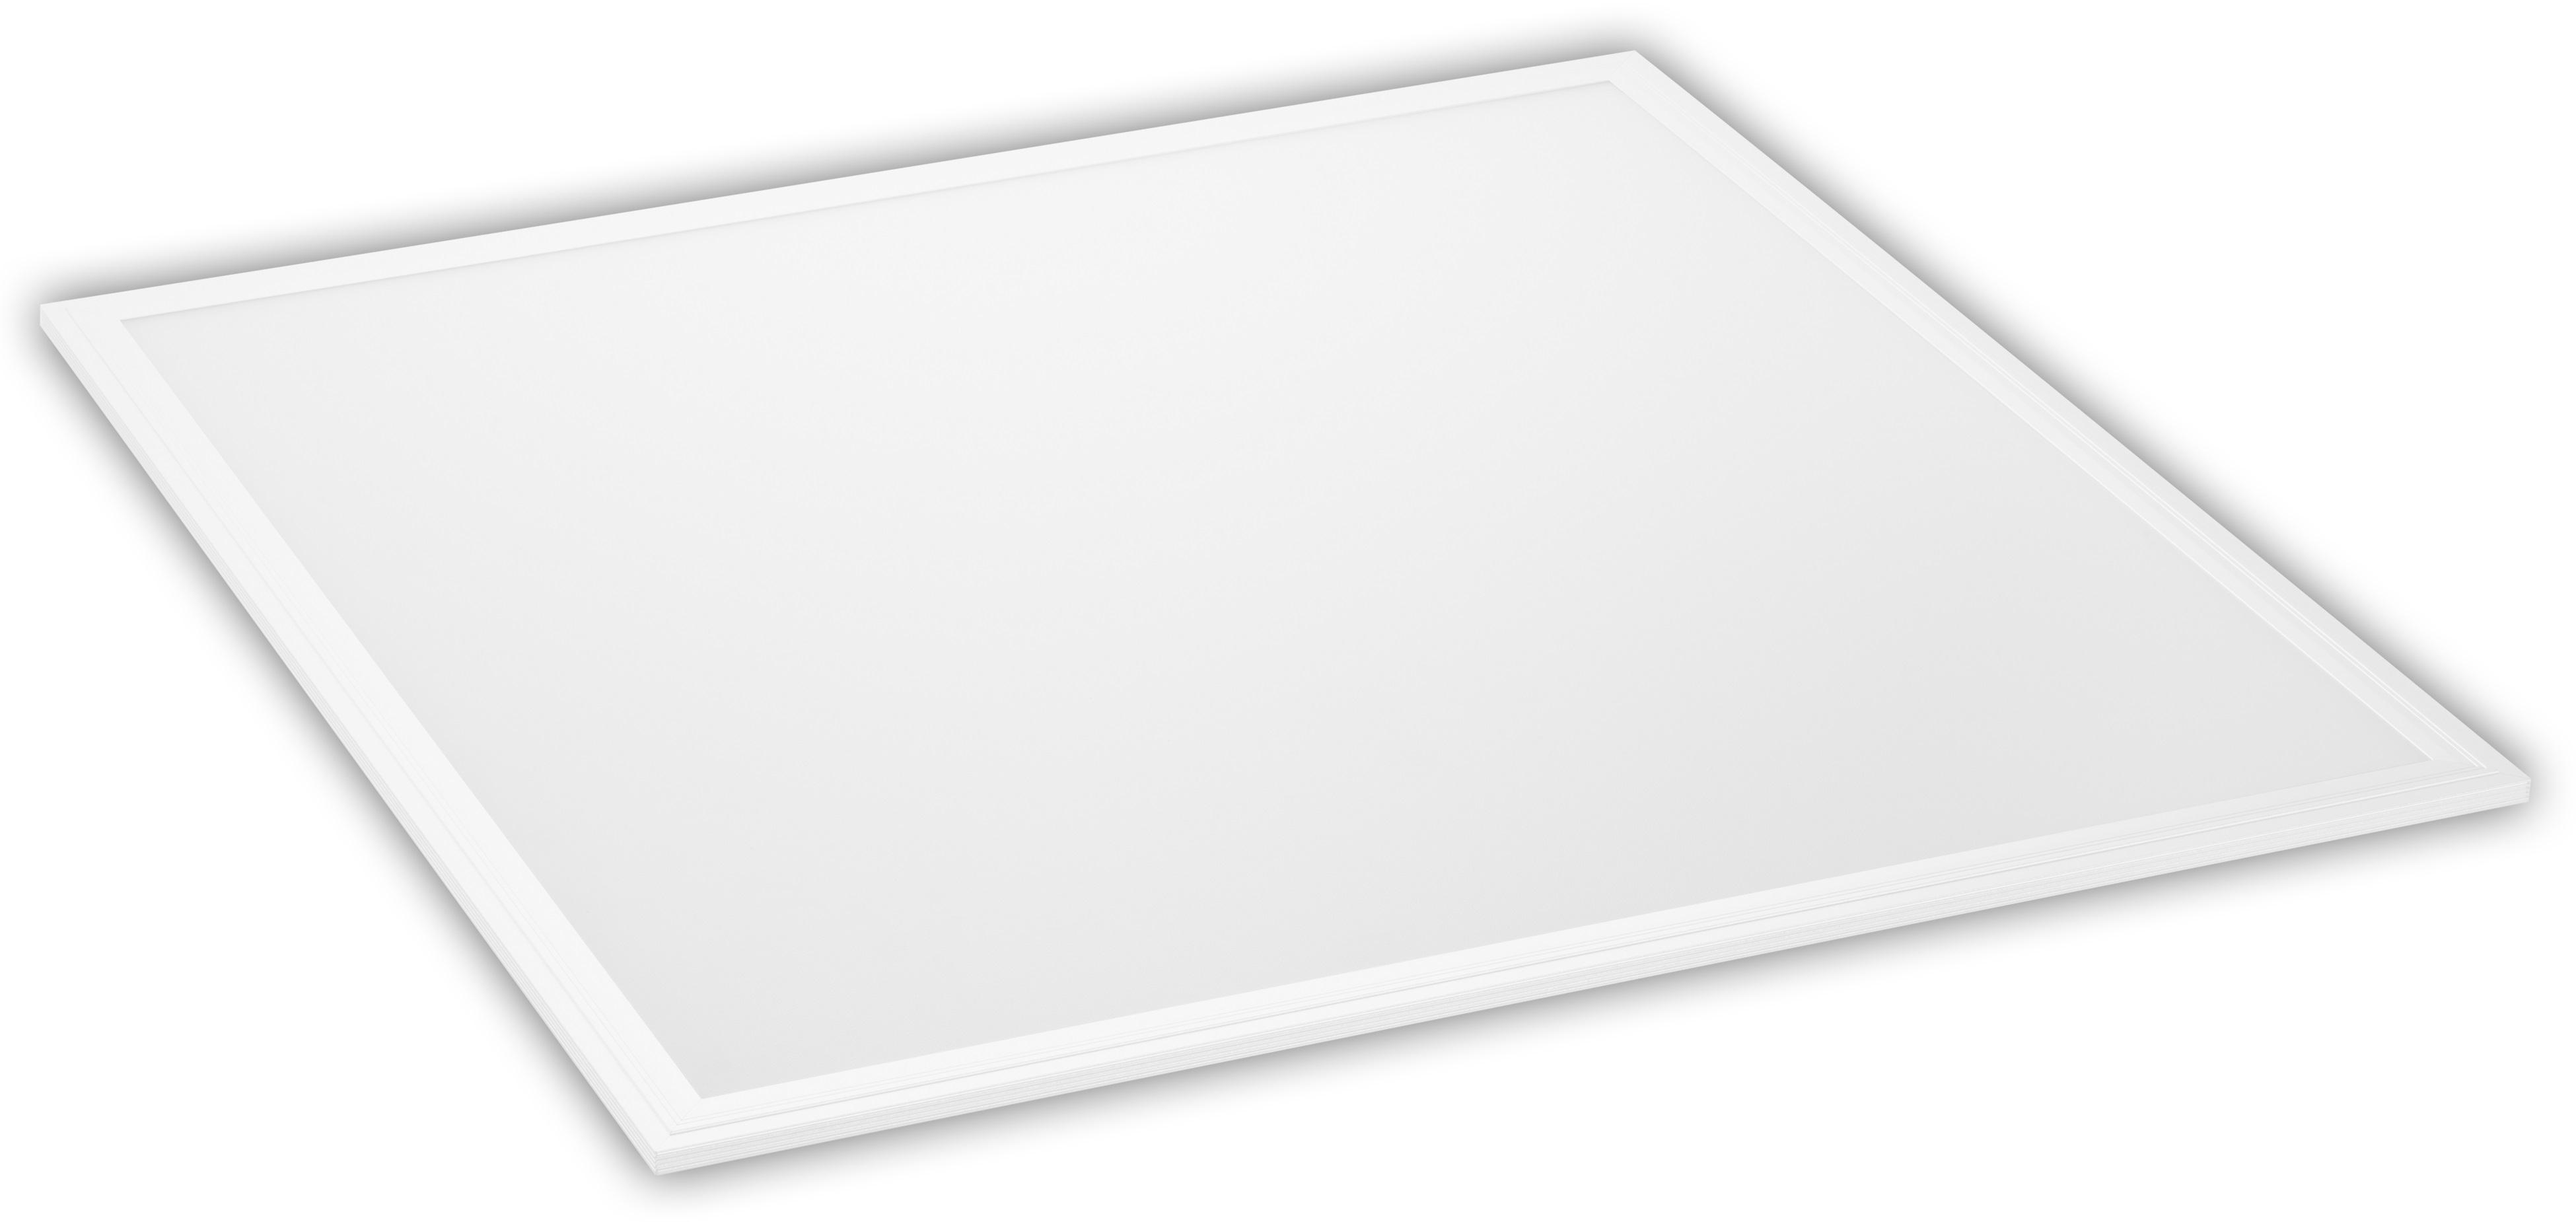 1 Stk LED Panel 42W, 3600lm, 830, M600, 1050mA, ohne Treiber LI29001080